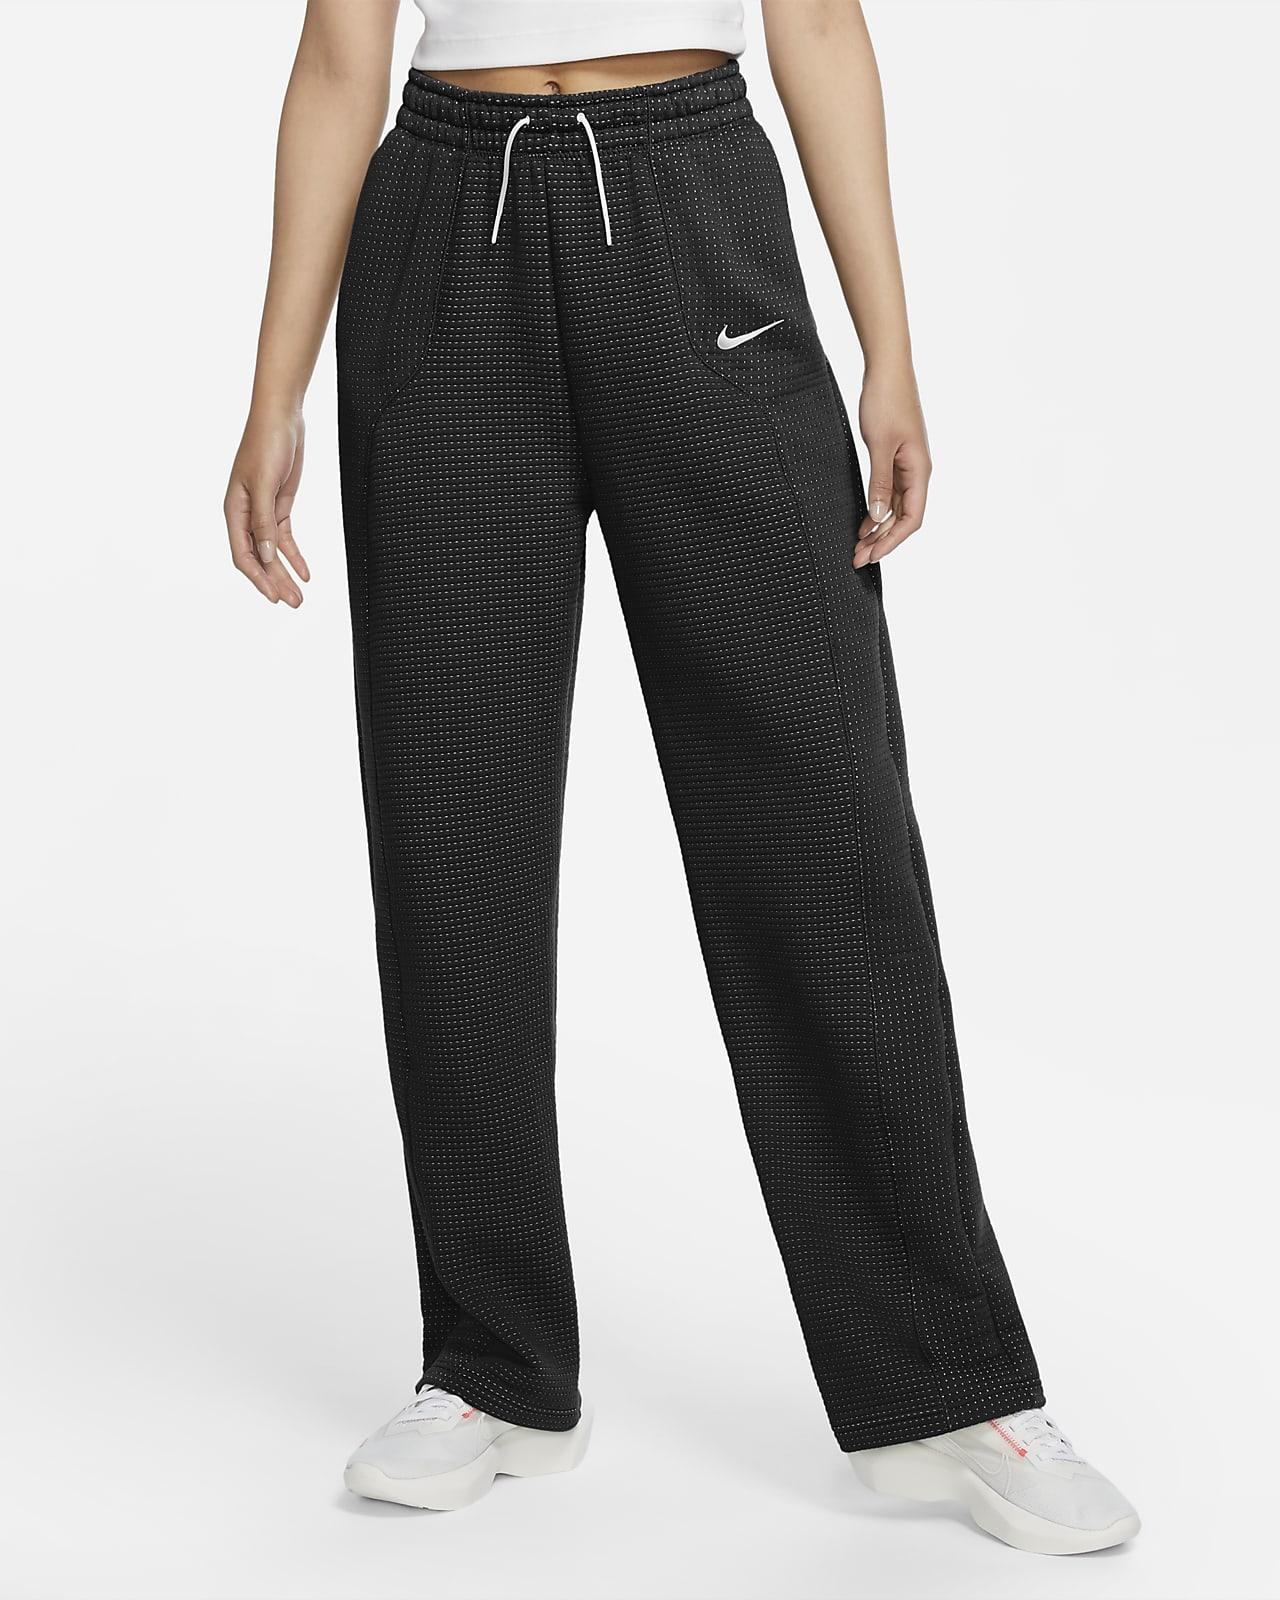 Pantalon technique en jacquard intégral Nike Sportswear Tech Fleece pour Femme